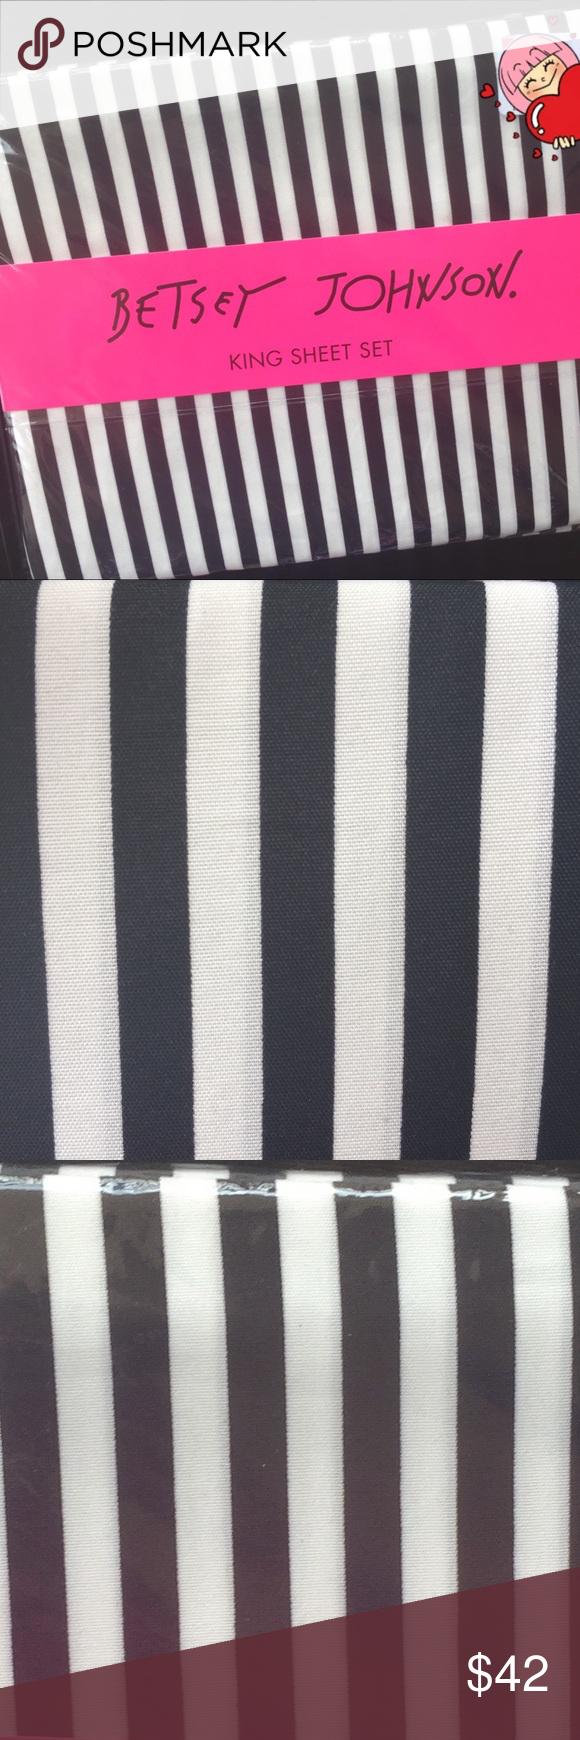 Betsey Johnson Black White Stripe King Sheet Set Nwt Betsey Johnson Black White Stripe King 4 Piece Sheet Set White And Bol It Feels Like Home Black